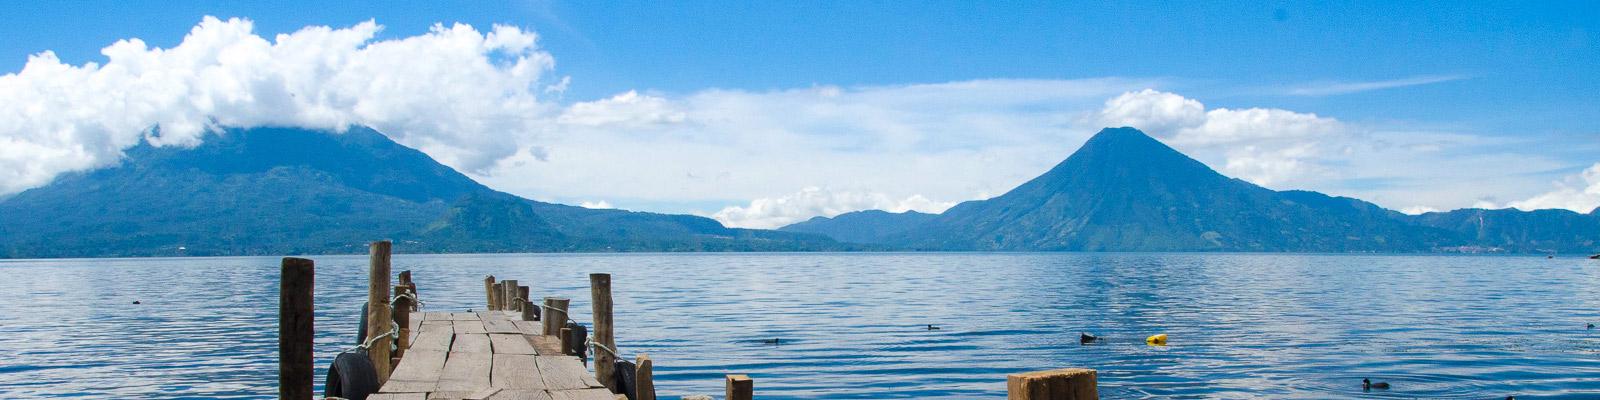 Easy Hiking Vacation Luxury Guatemala Private Travel Tours - Guatemala vacation